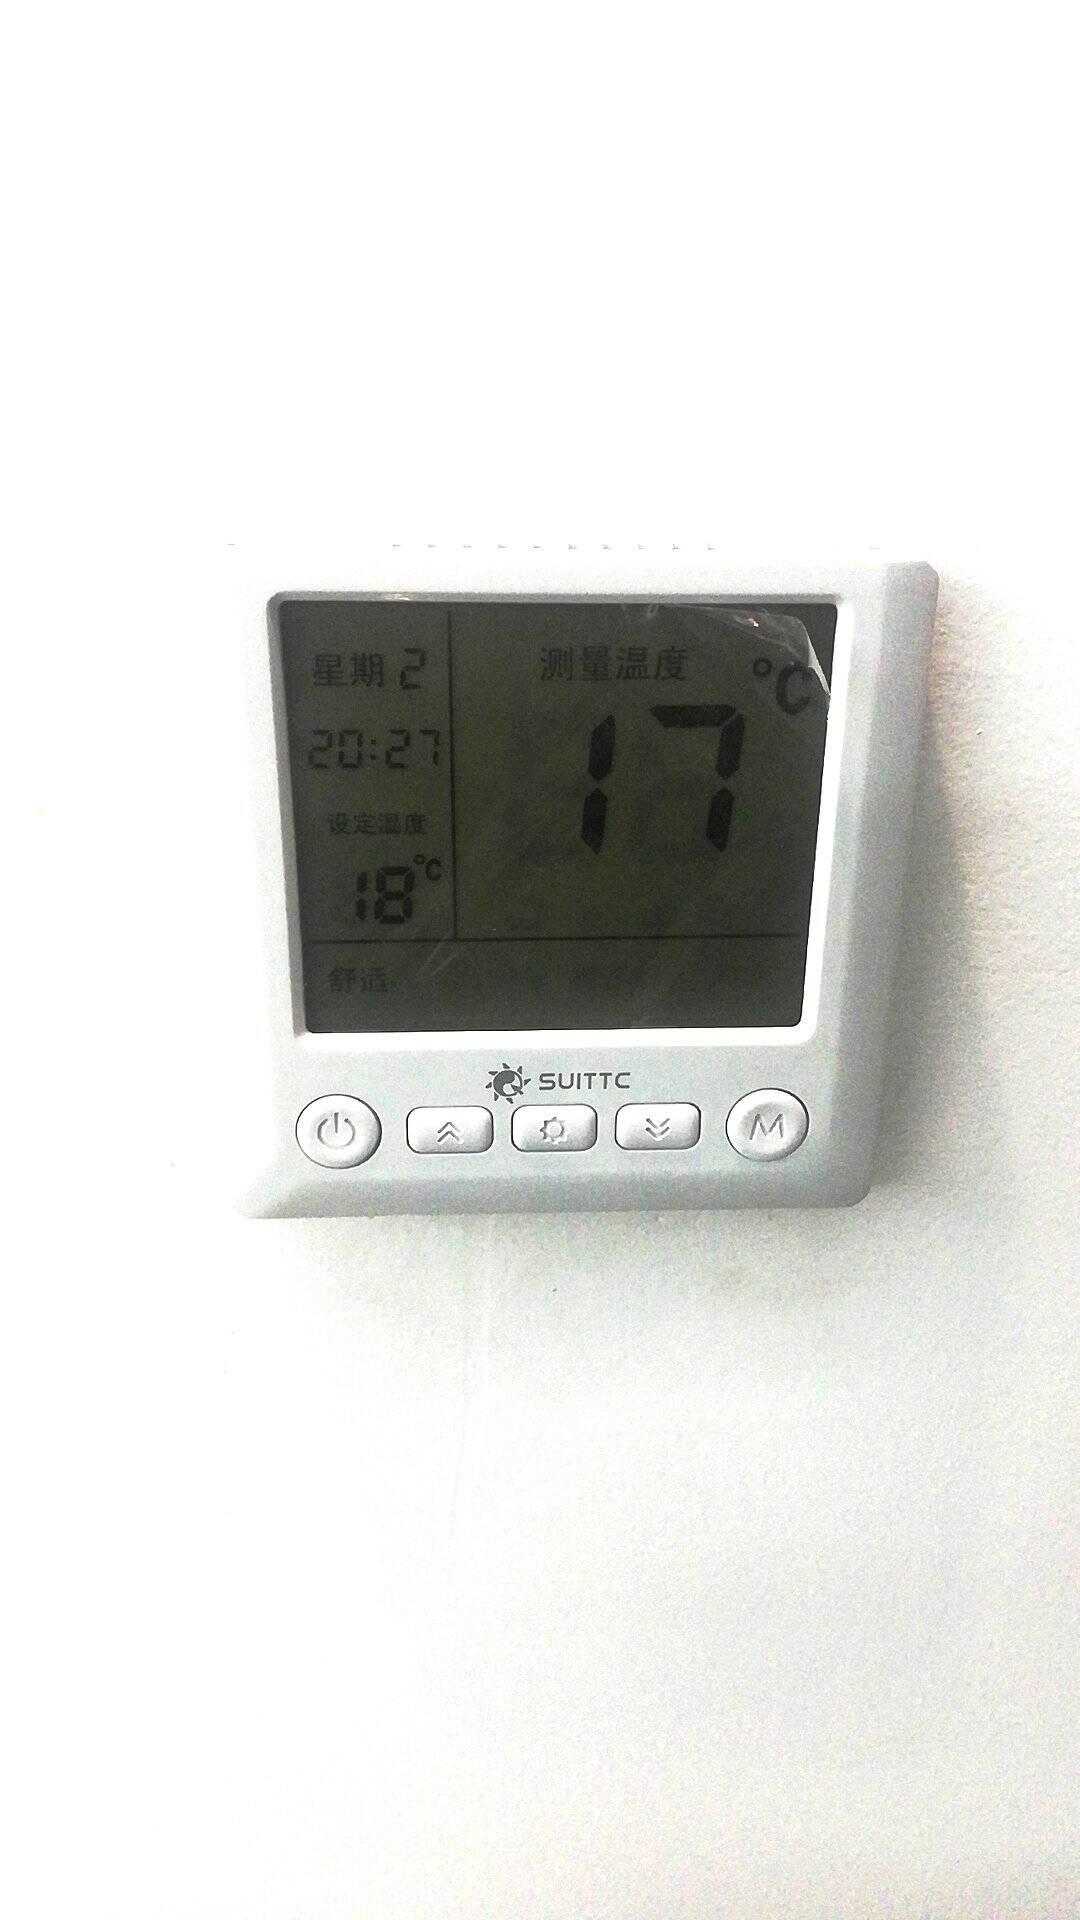 SUITTC鑫源壁挂炉水地暖水泵联动智能分水器无线款分室集中控制有线无线8606R无线面板